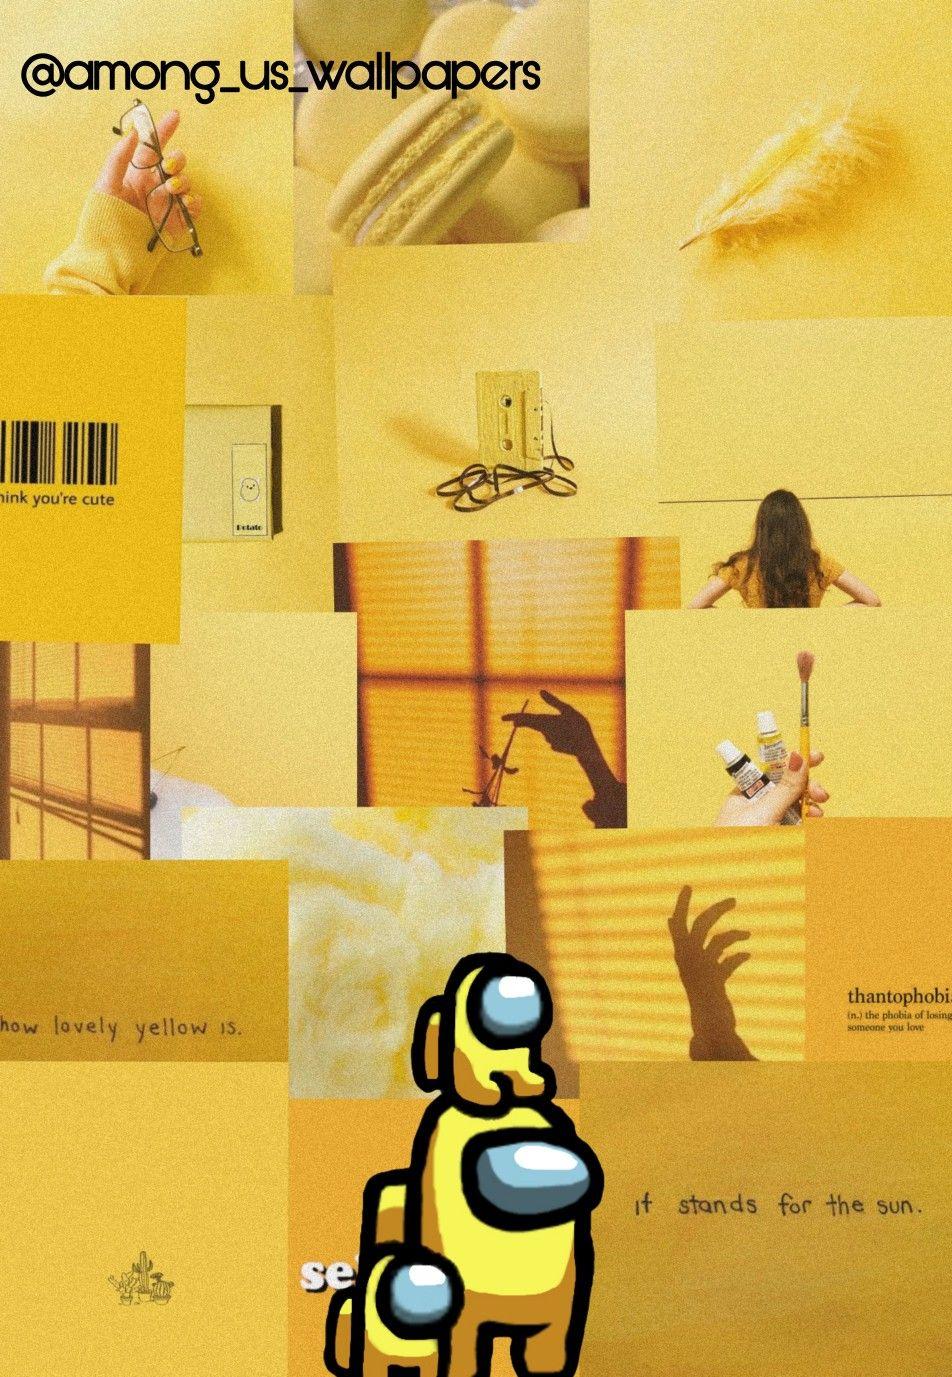 Among Us Wallpapers Yellow Among Us Wallpapers Among Us Yellow Yellow A Iphone Wallpaper Yellow Wallpaper Iphone Neon Iphone Wallpaper Tumblr Aesthetic